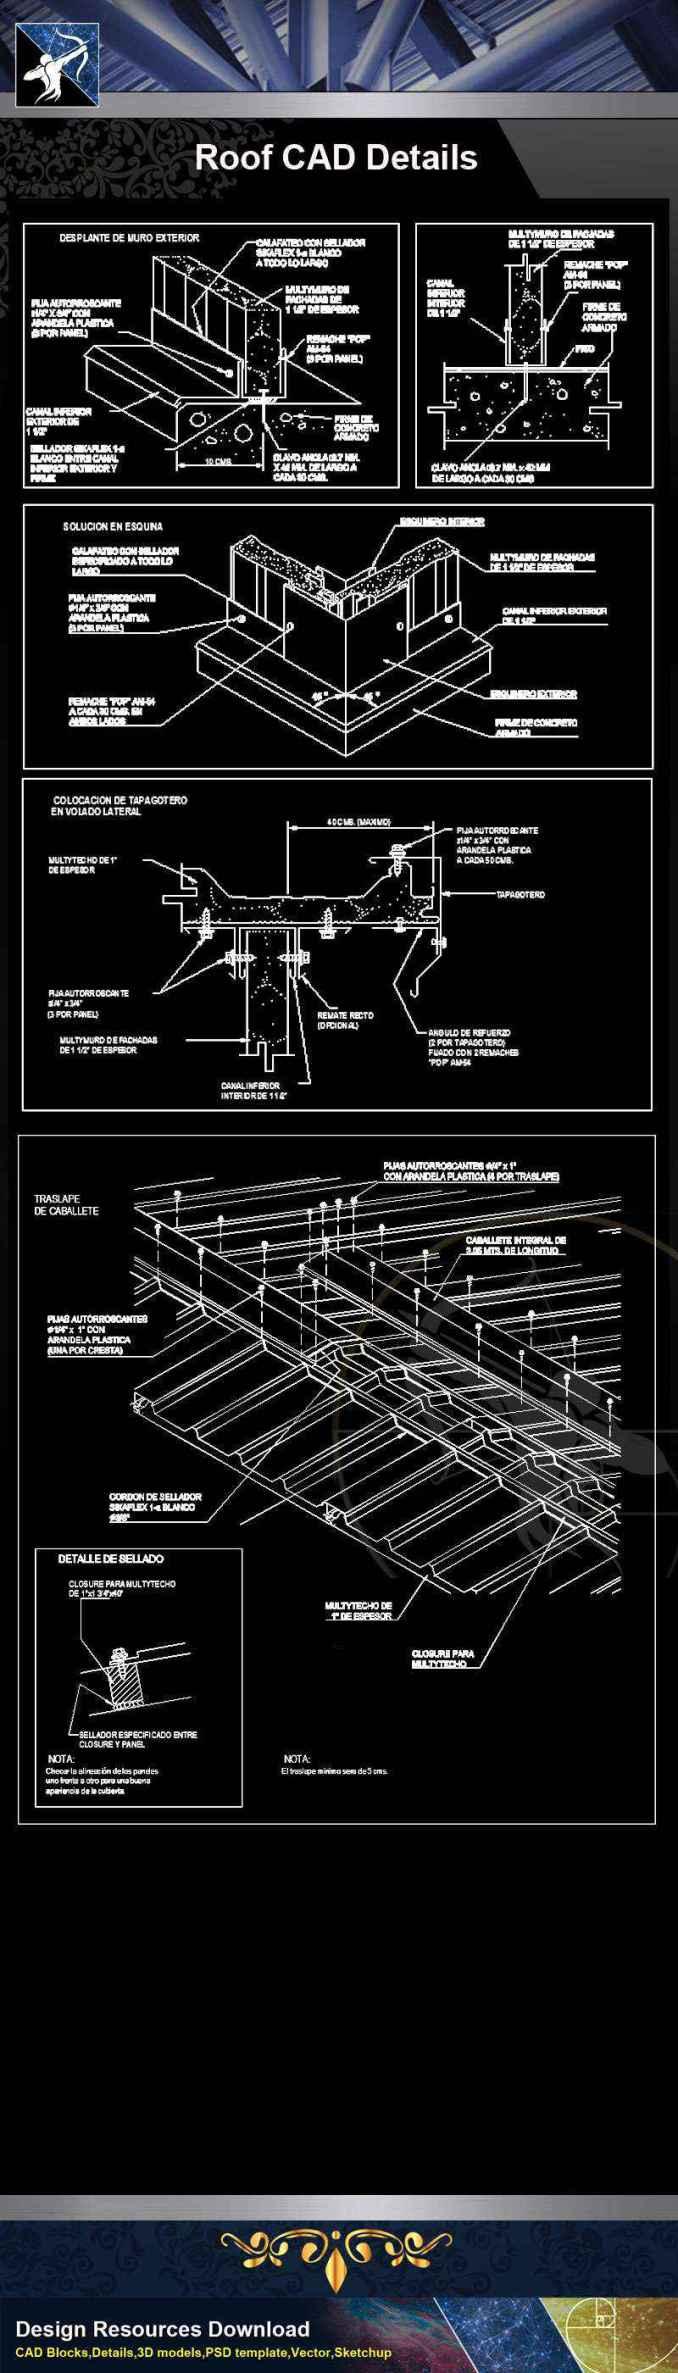 【Architecture CAD Details Collections】Roof CAD Details V.2